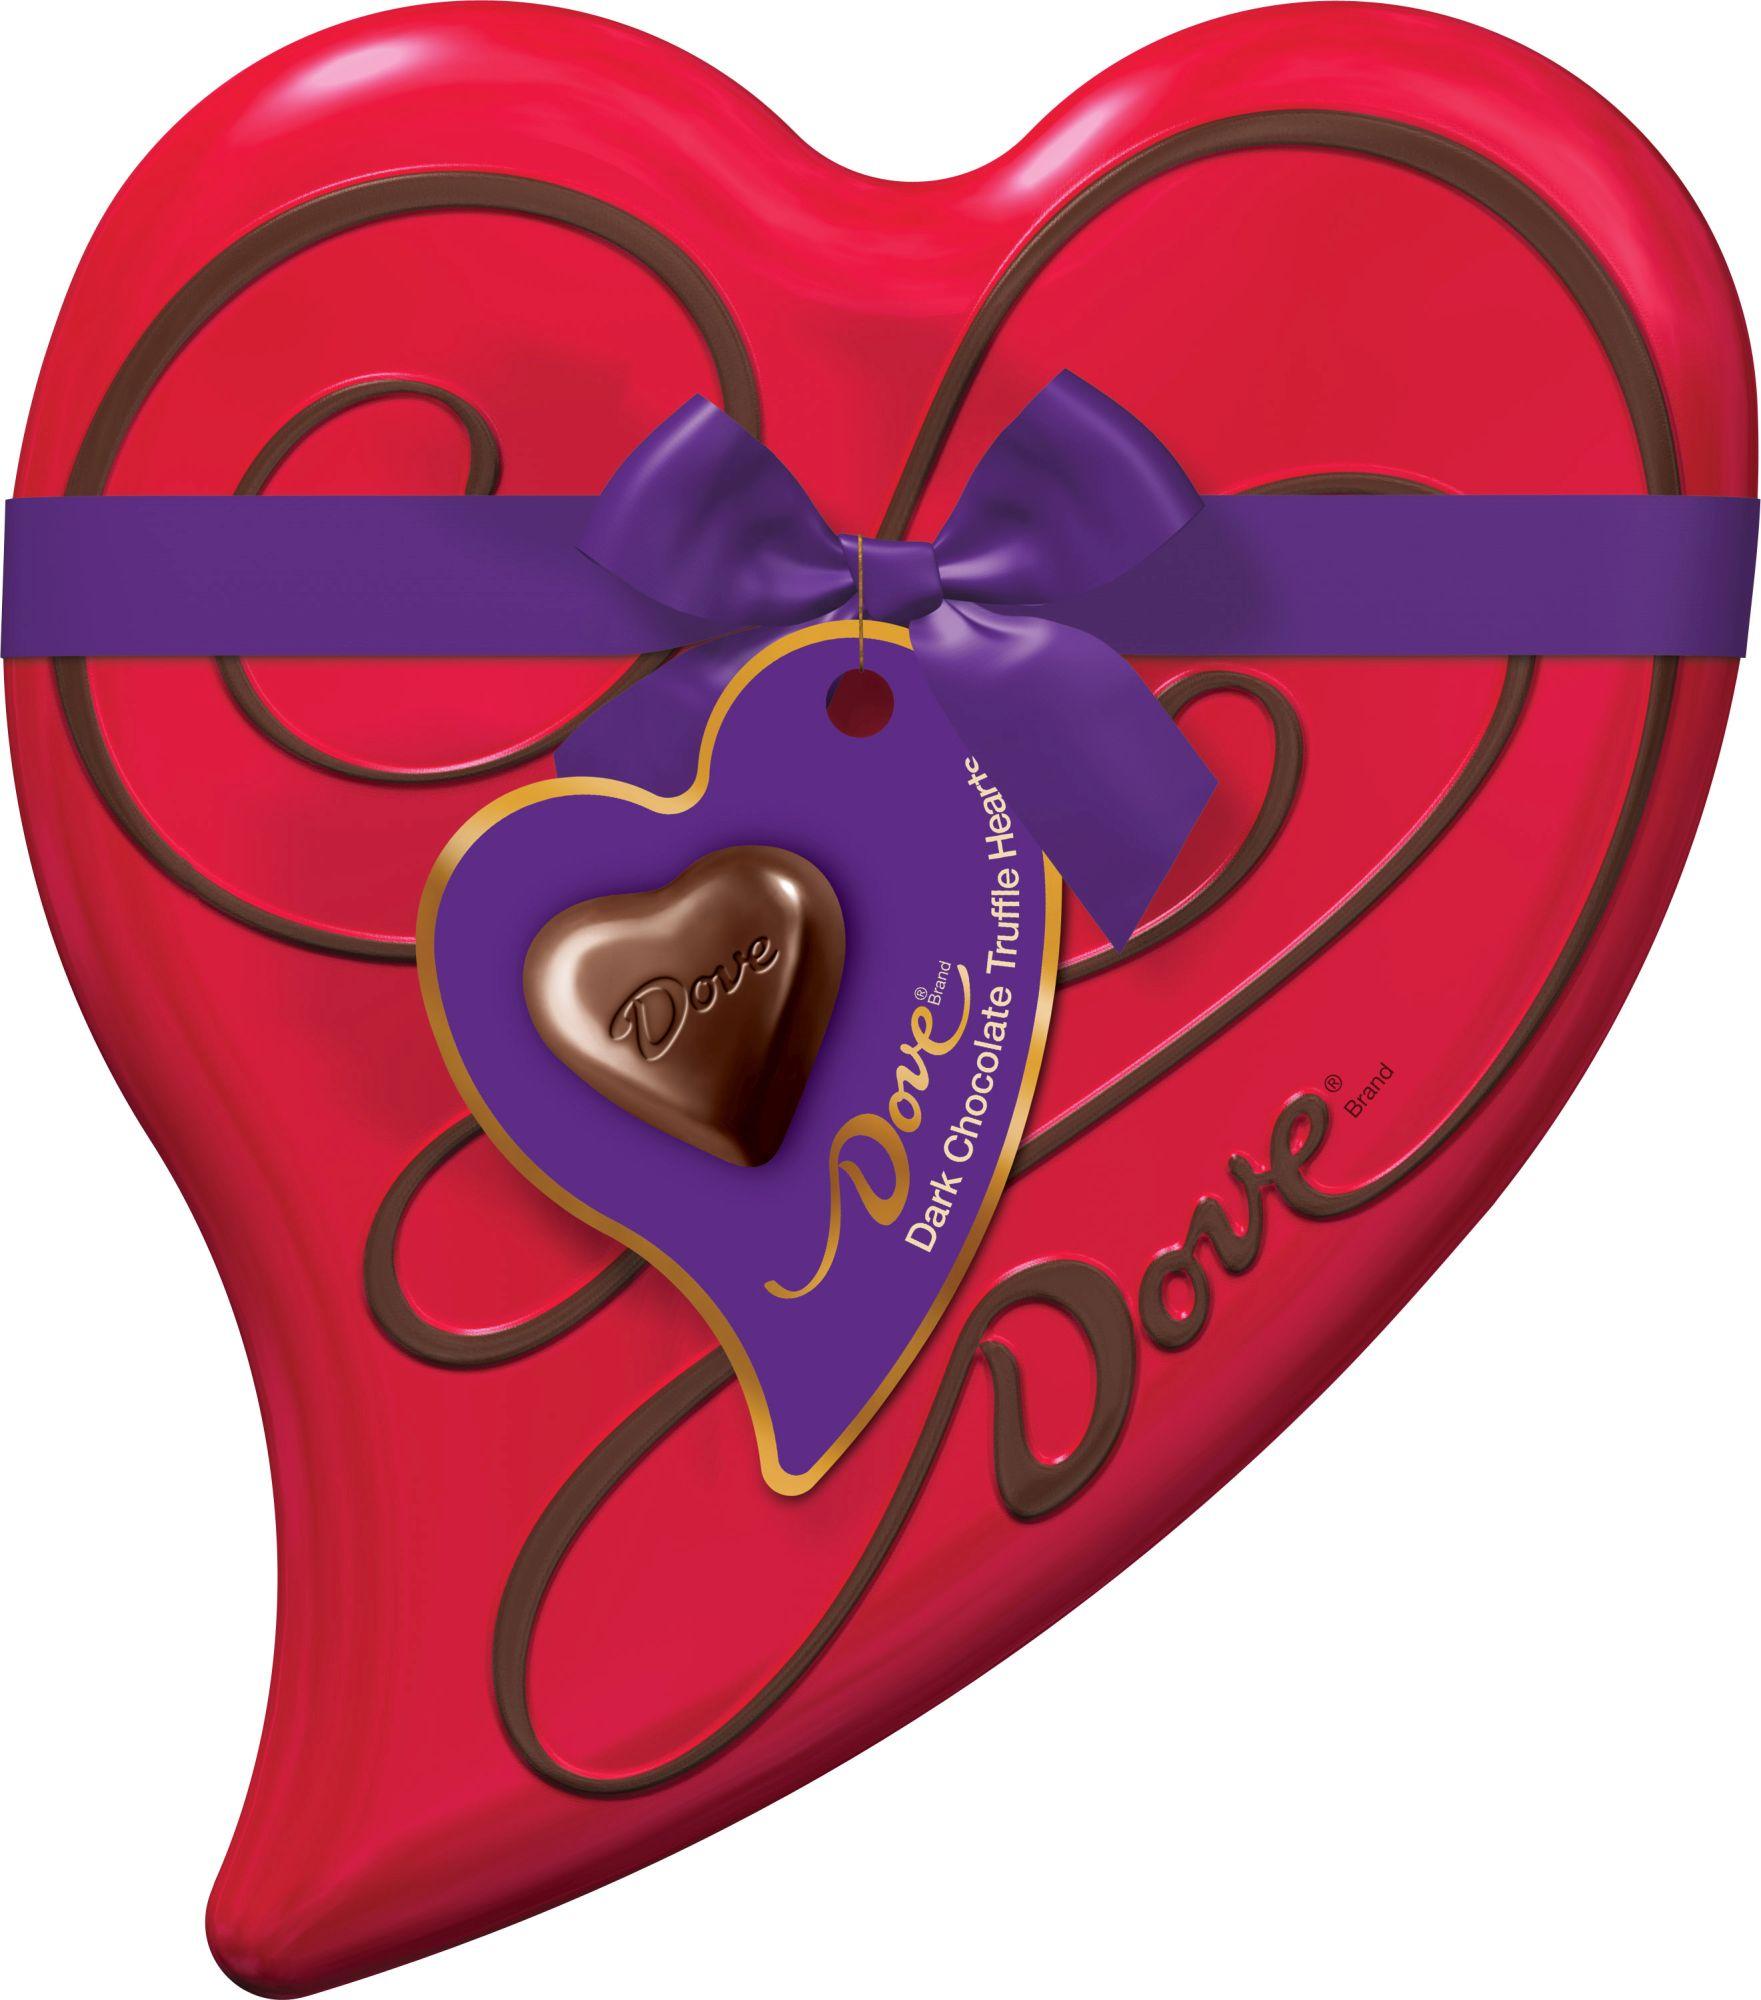 Mars Dove Valentine Dark Chocolate Truffle Heart Tin 6.5oz PartNumber: 033W008855727001P KsnValue: 8855727 MfgPartNumber: 08855727